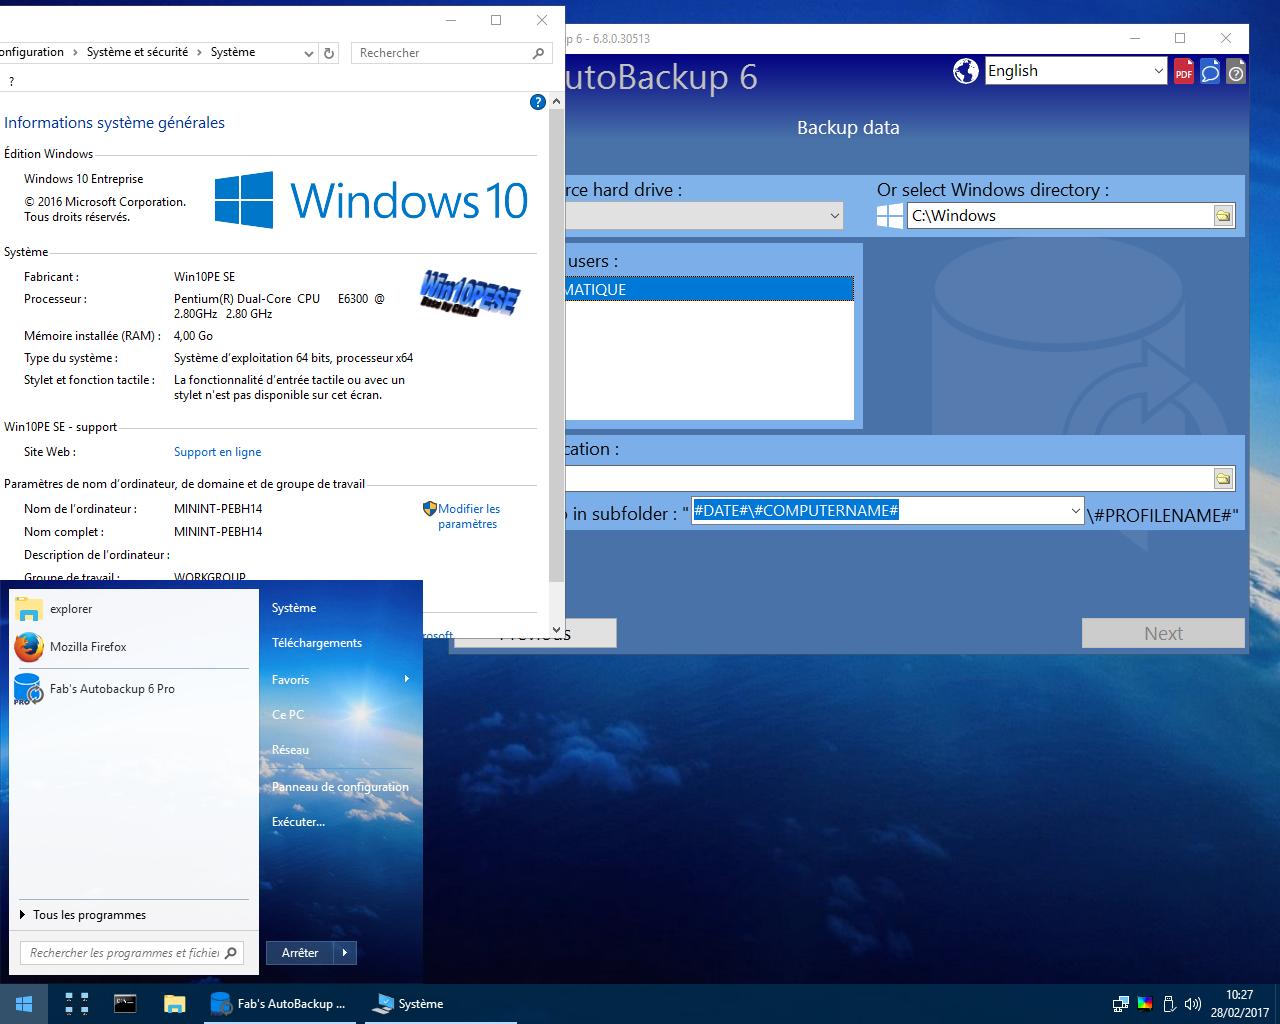 Fab's AutoBackup 6 Pro running inside WIN10PE SE